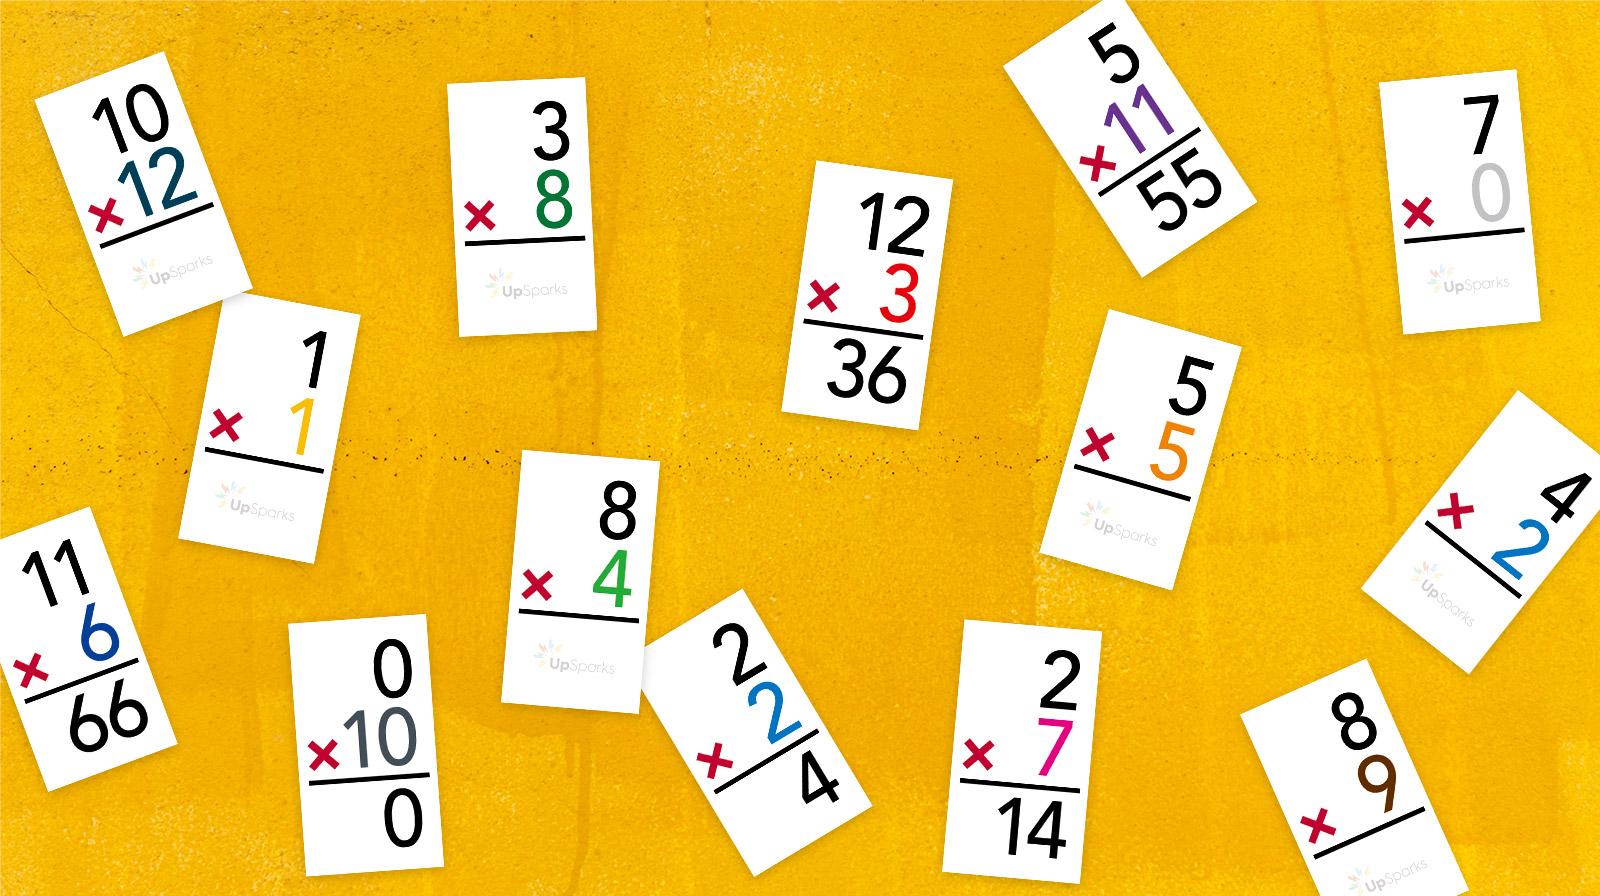 Flash Card Resources - Upsparks